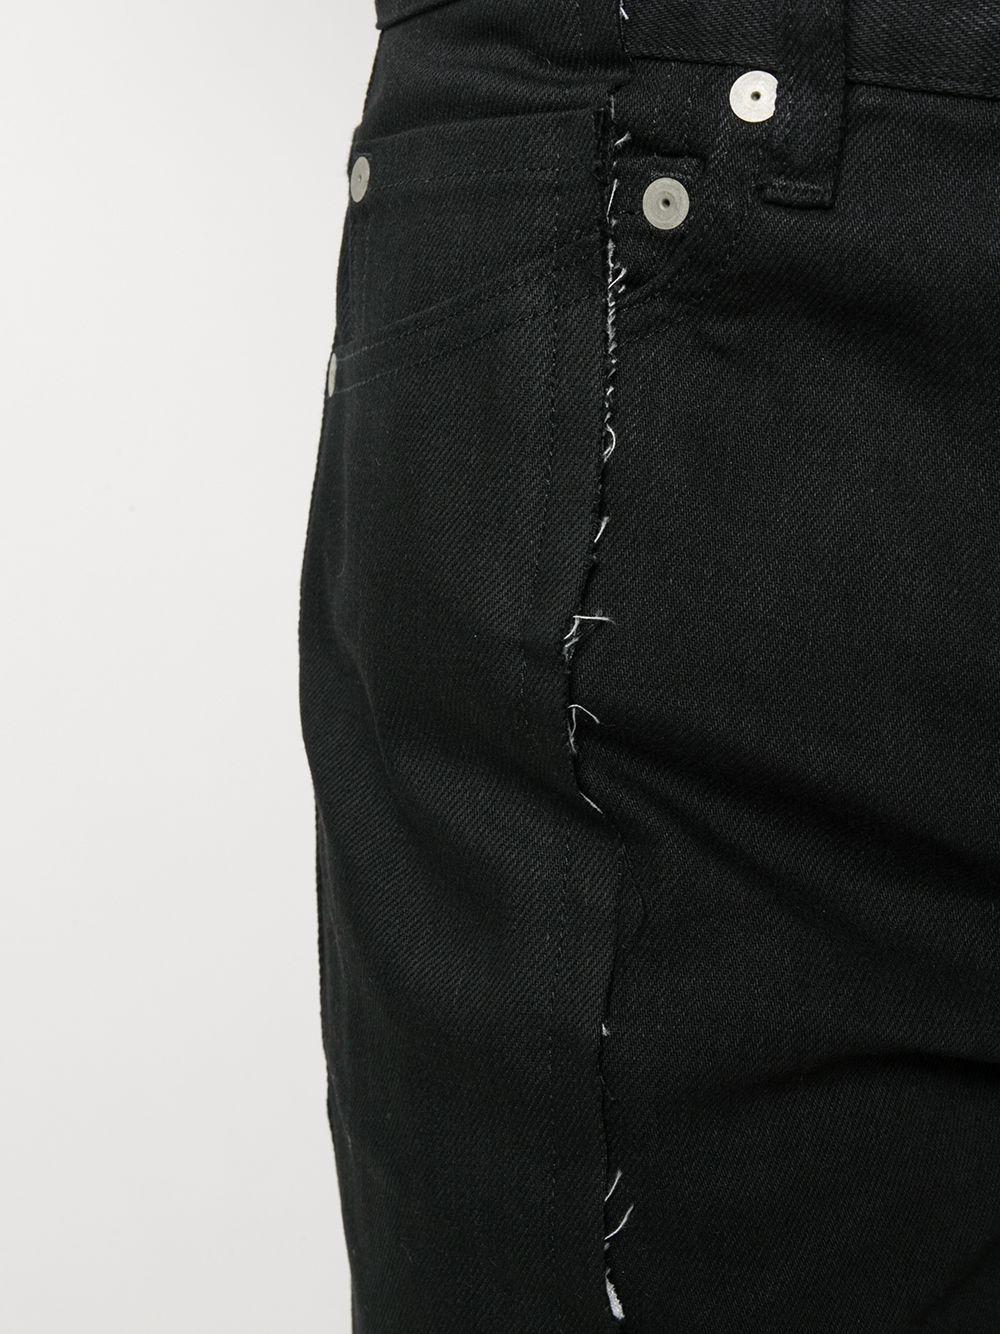 Maison Margiela | Maison Margiela прямые джинсы | Clouty